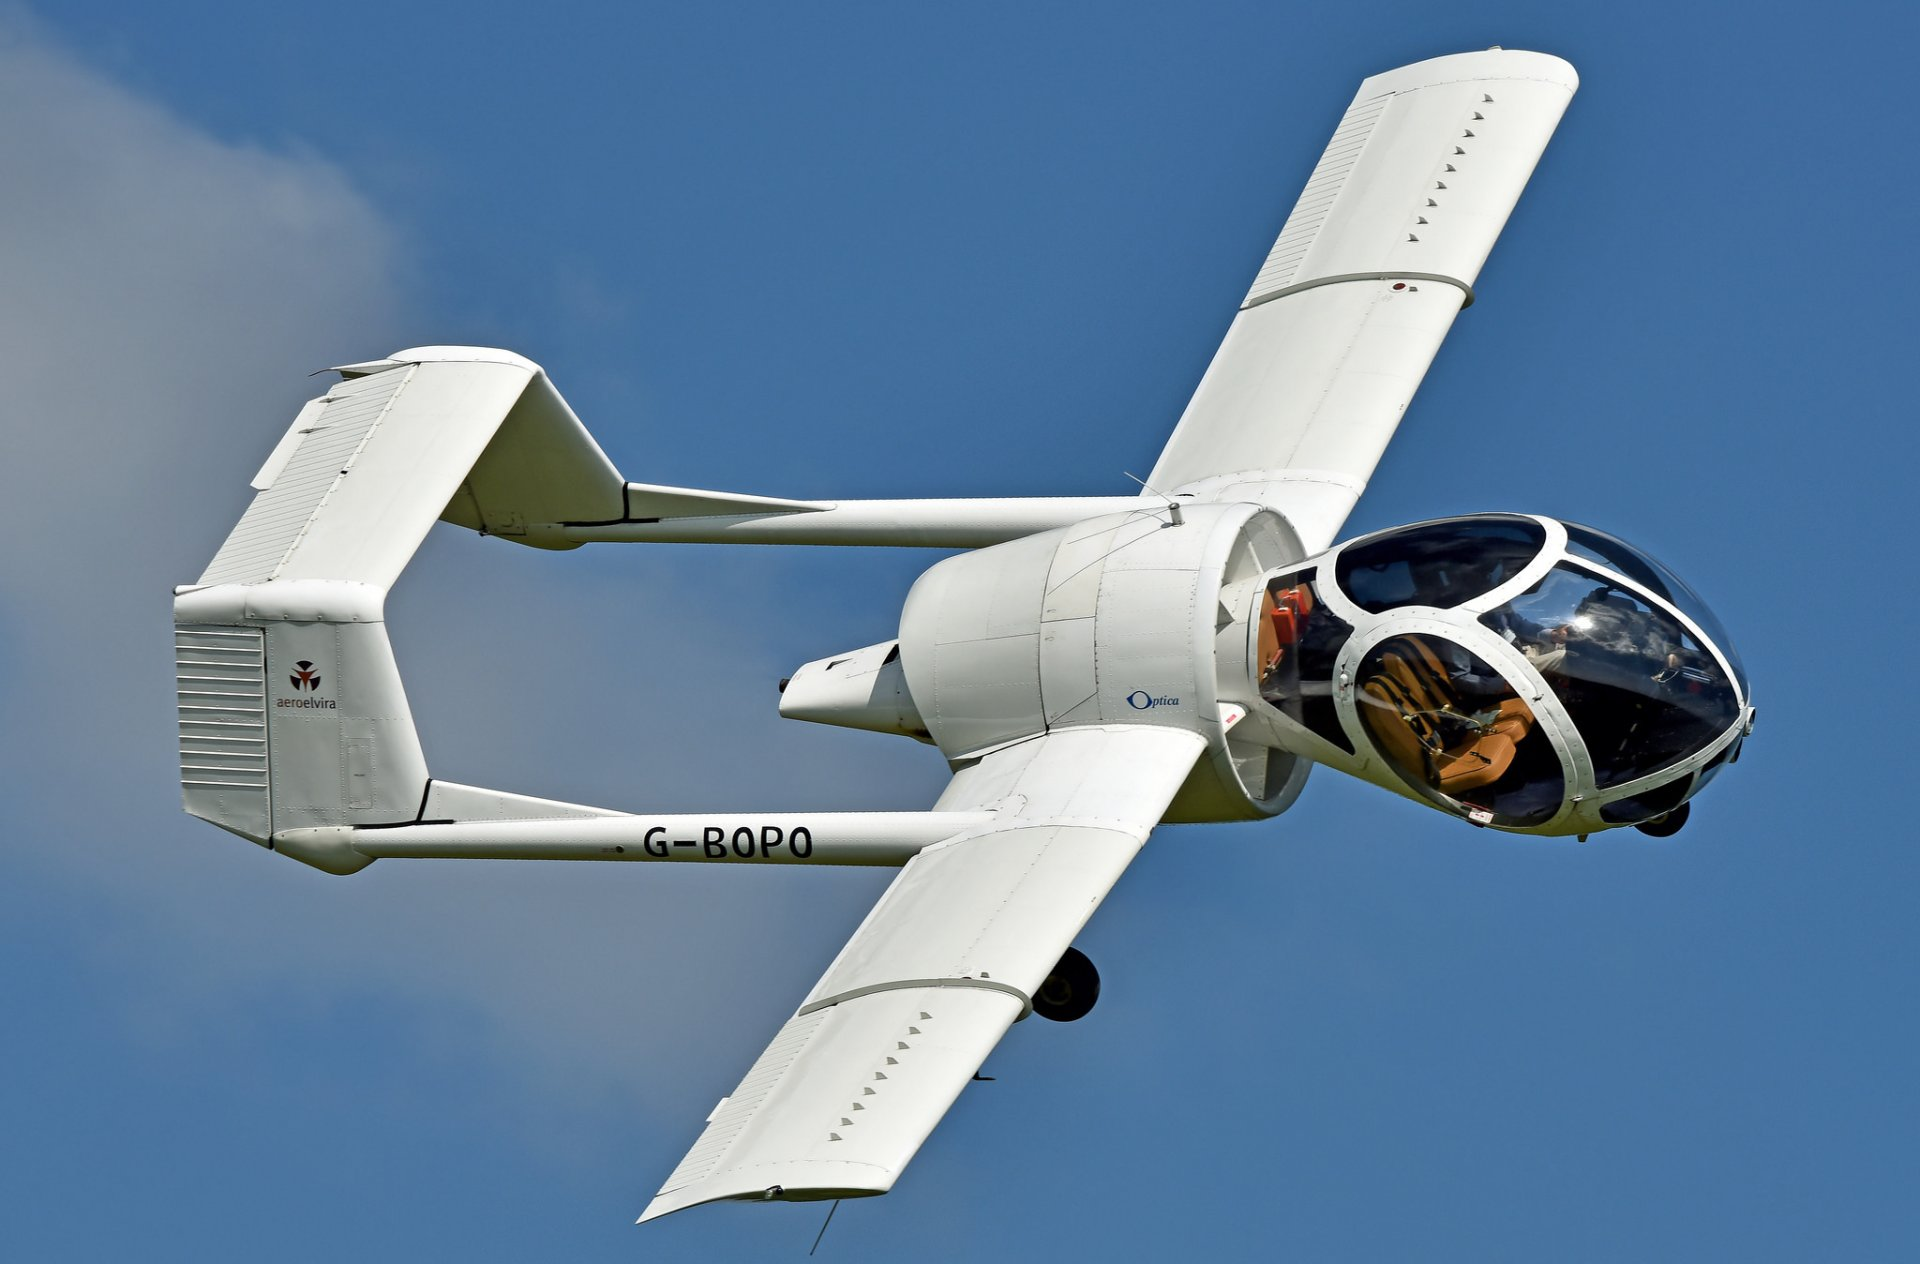 edgley-ea7-optica-plane-aerial-reconnaissance.jpg